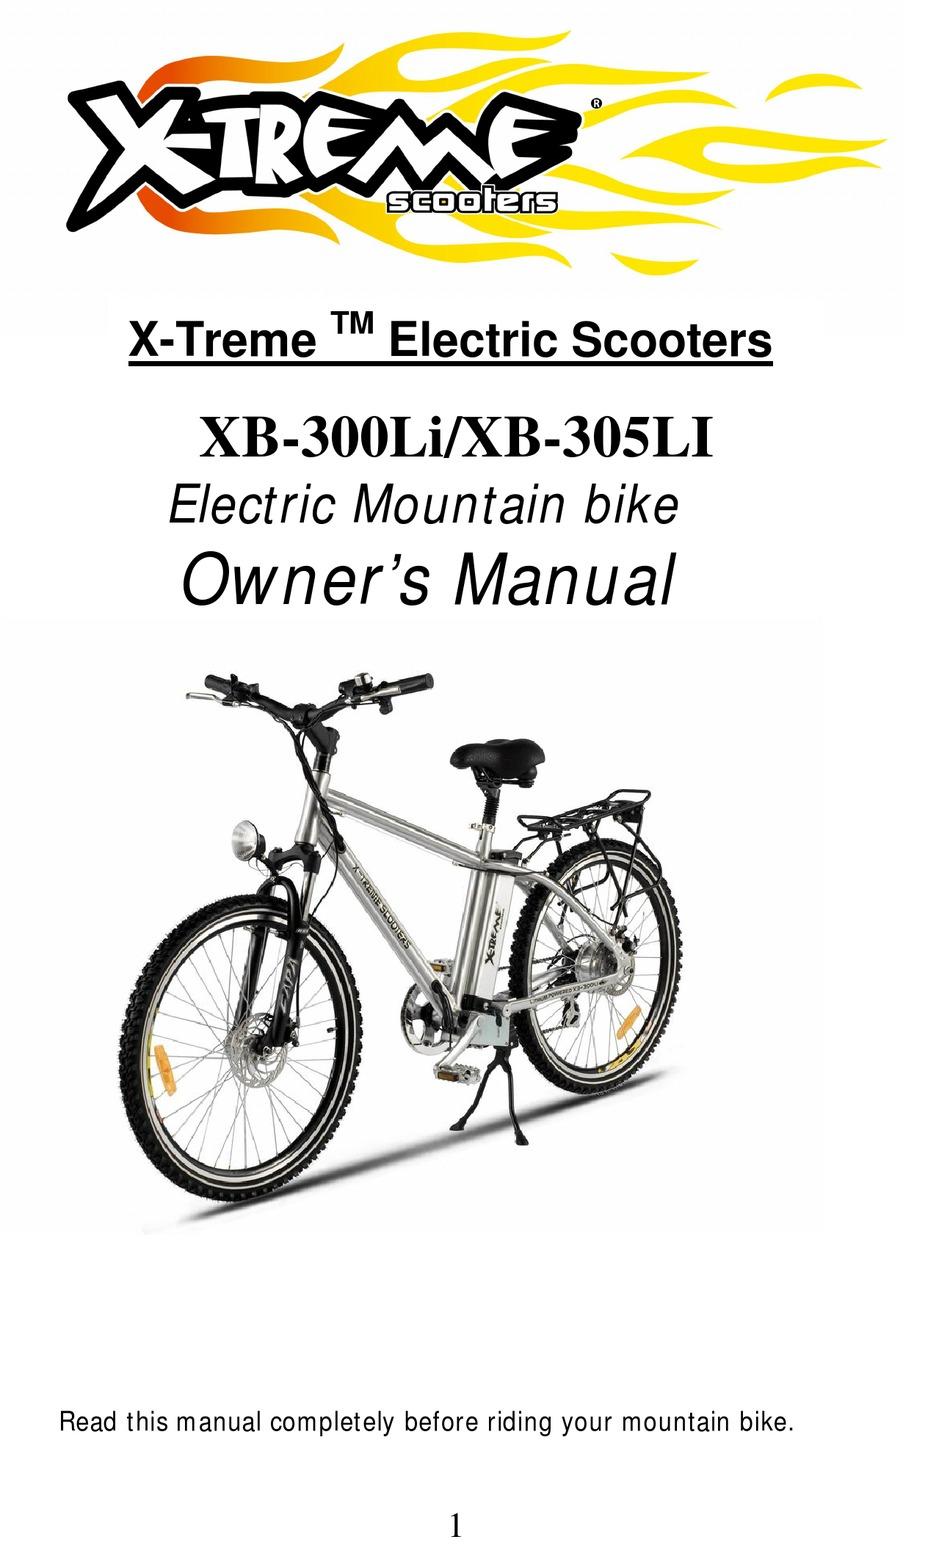 X-TREME XB-300LI OWNER'S MANUAL Pdf Download | ManualsLib | Xb 600 Xtreme Wiring Diagram |  | ManualsLib